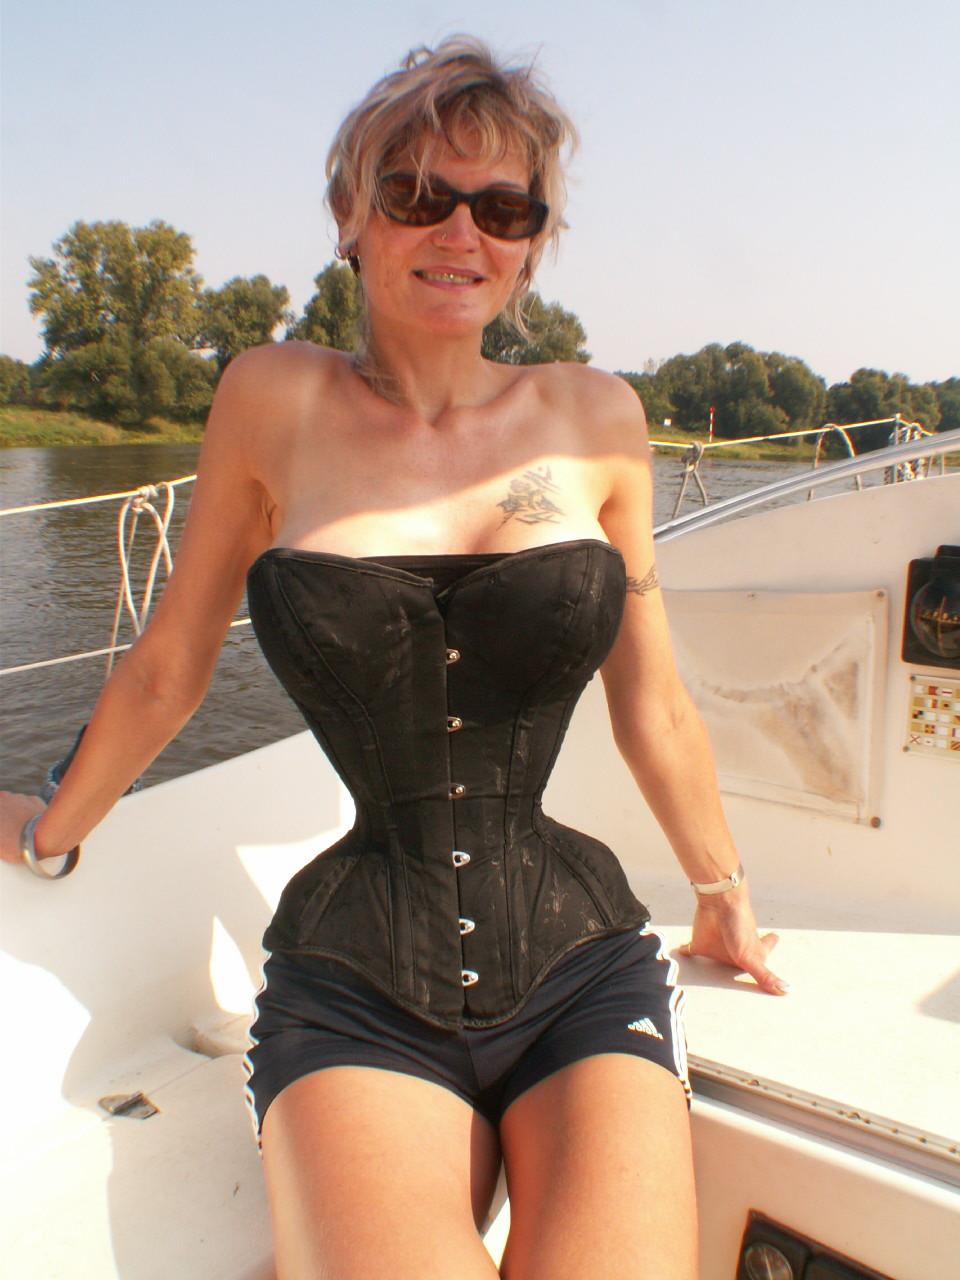 Королева Корсетов – Кэти Юнг (талия 38,1см) корсет, мода, талия, ужас